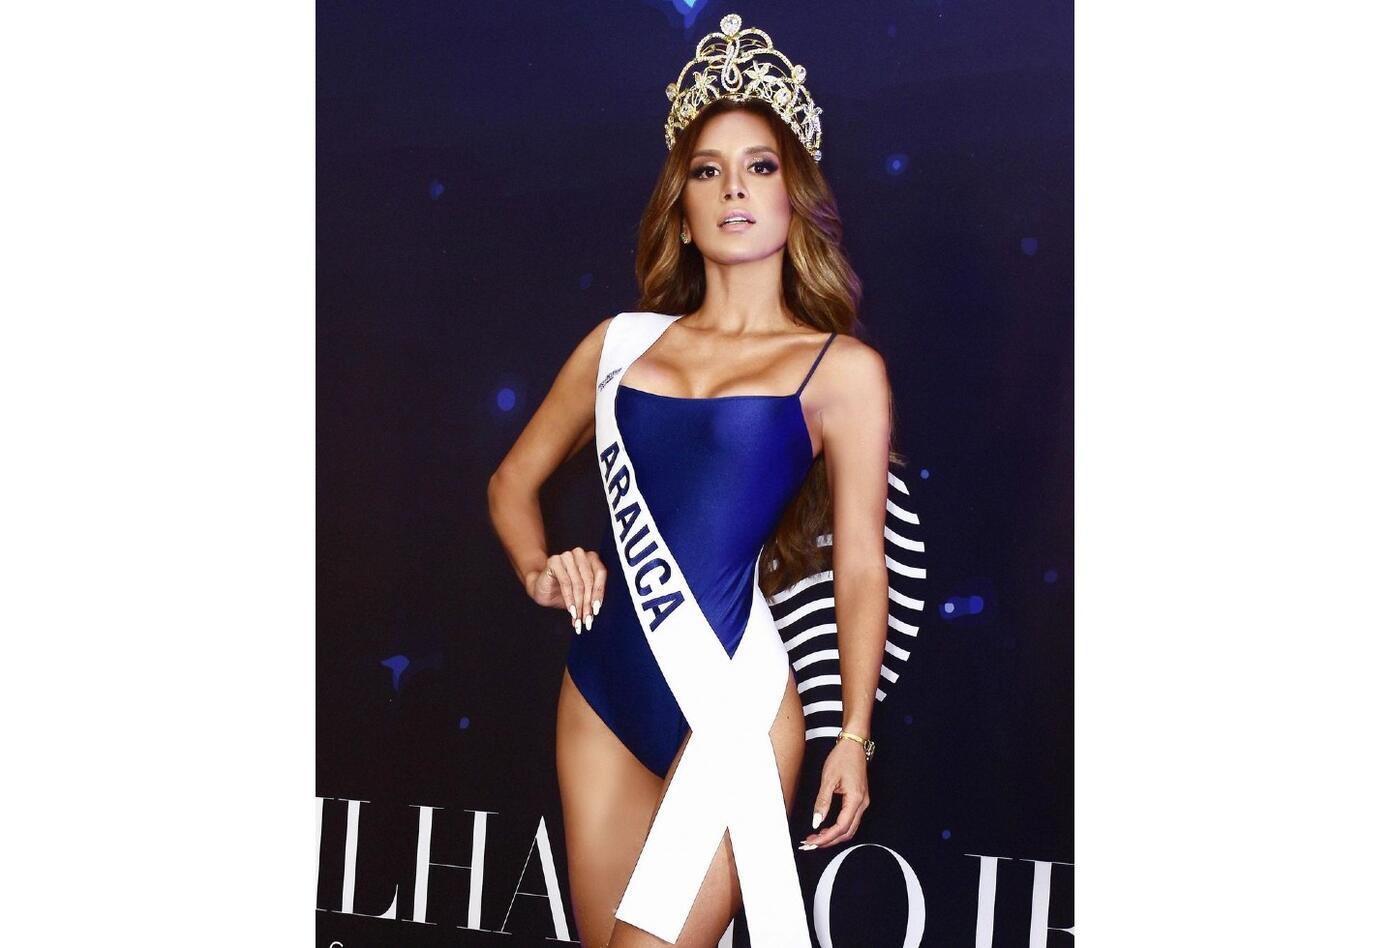 Miss Arauca, Genesis Andrea Quintero Pérez